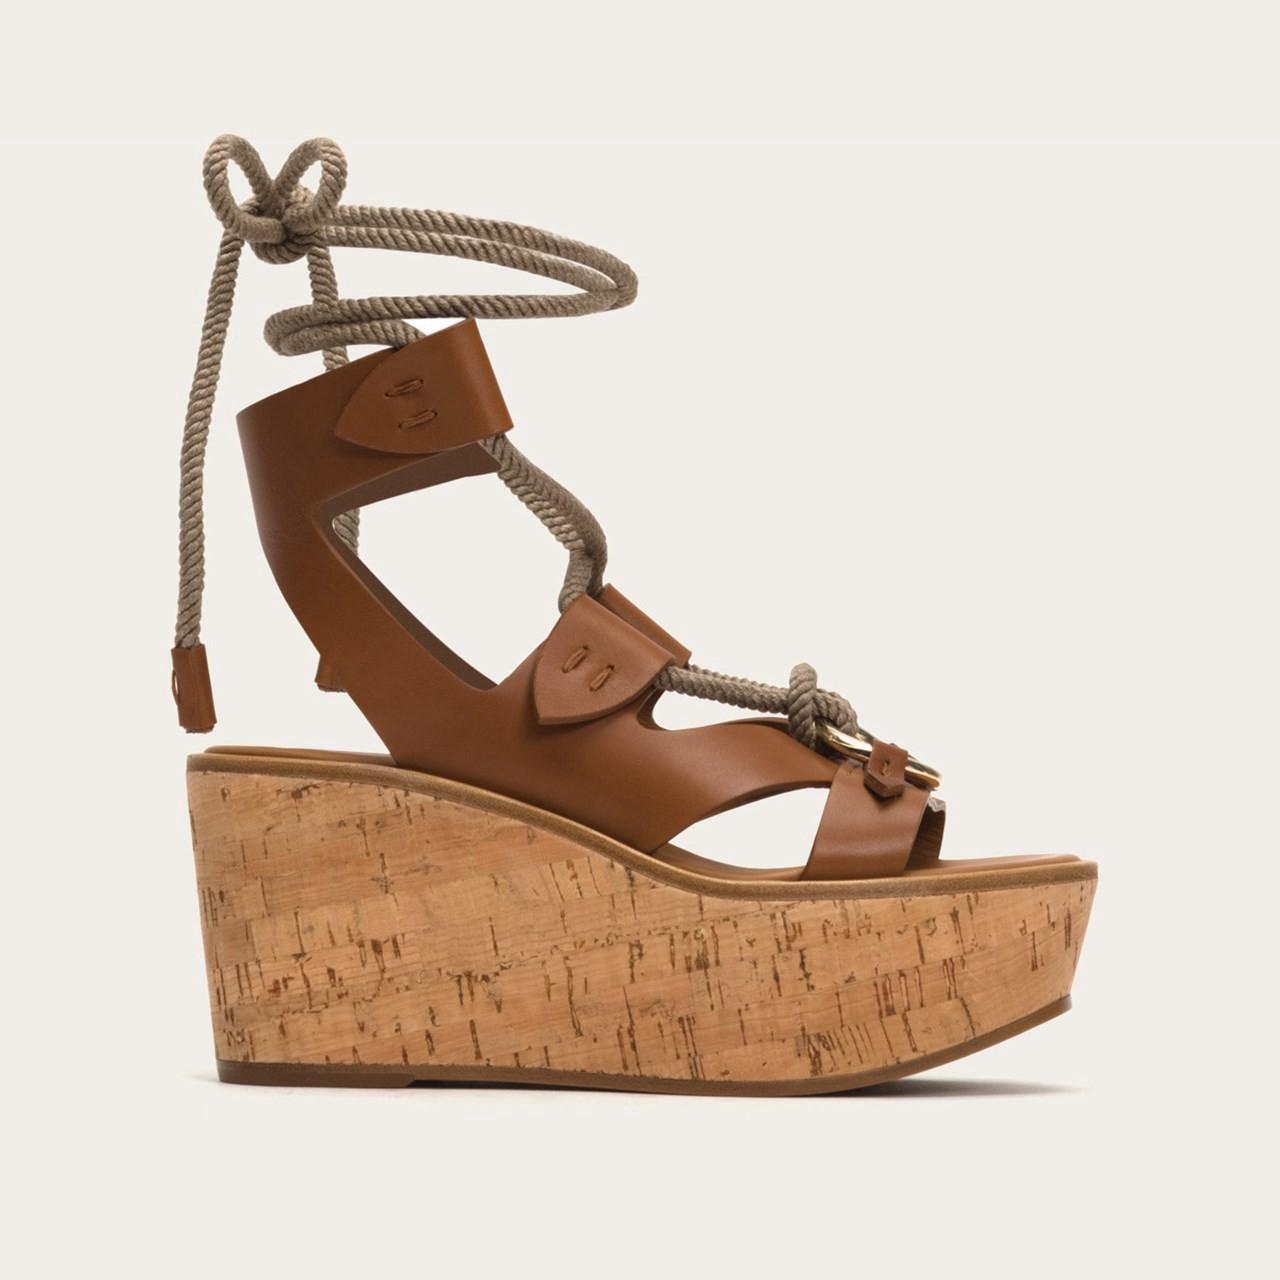 aafc7941a62 Dahlia Robe Wedge Sandals in Cognac